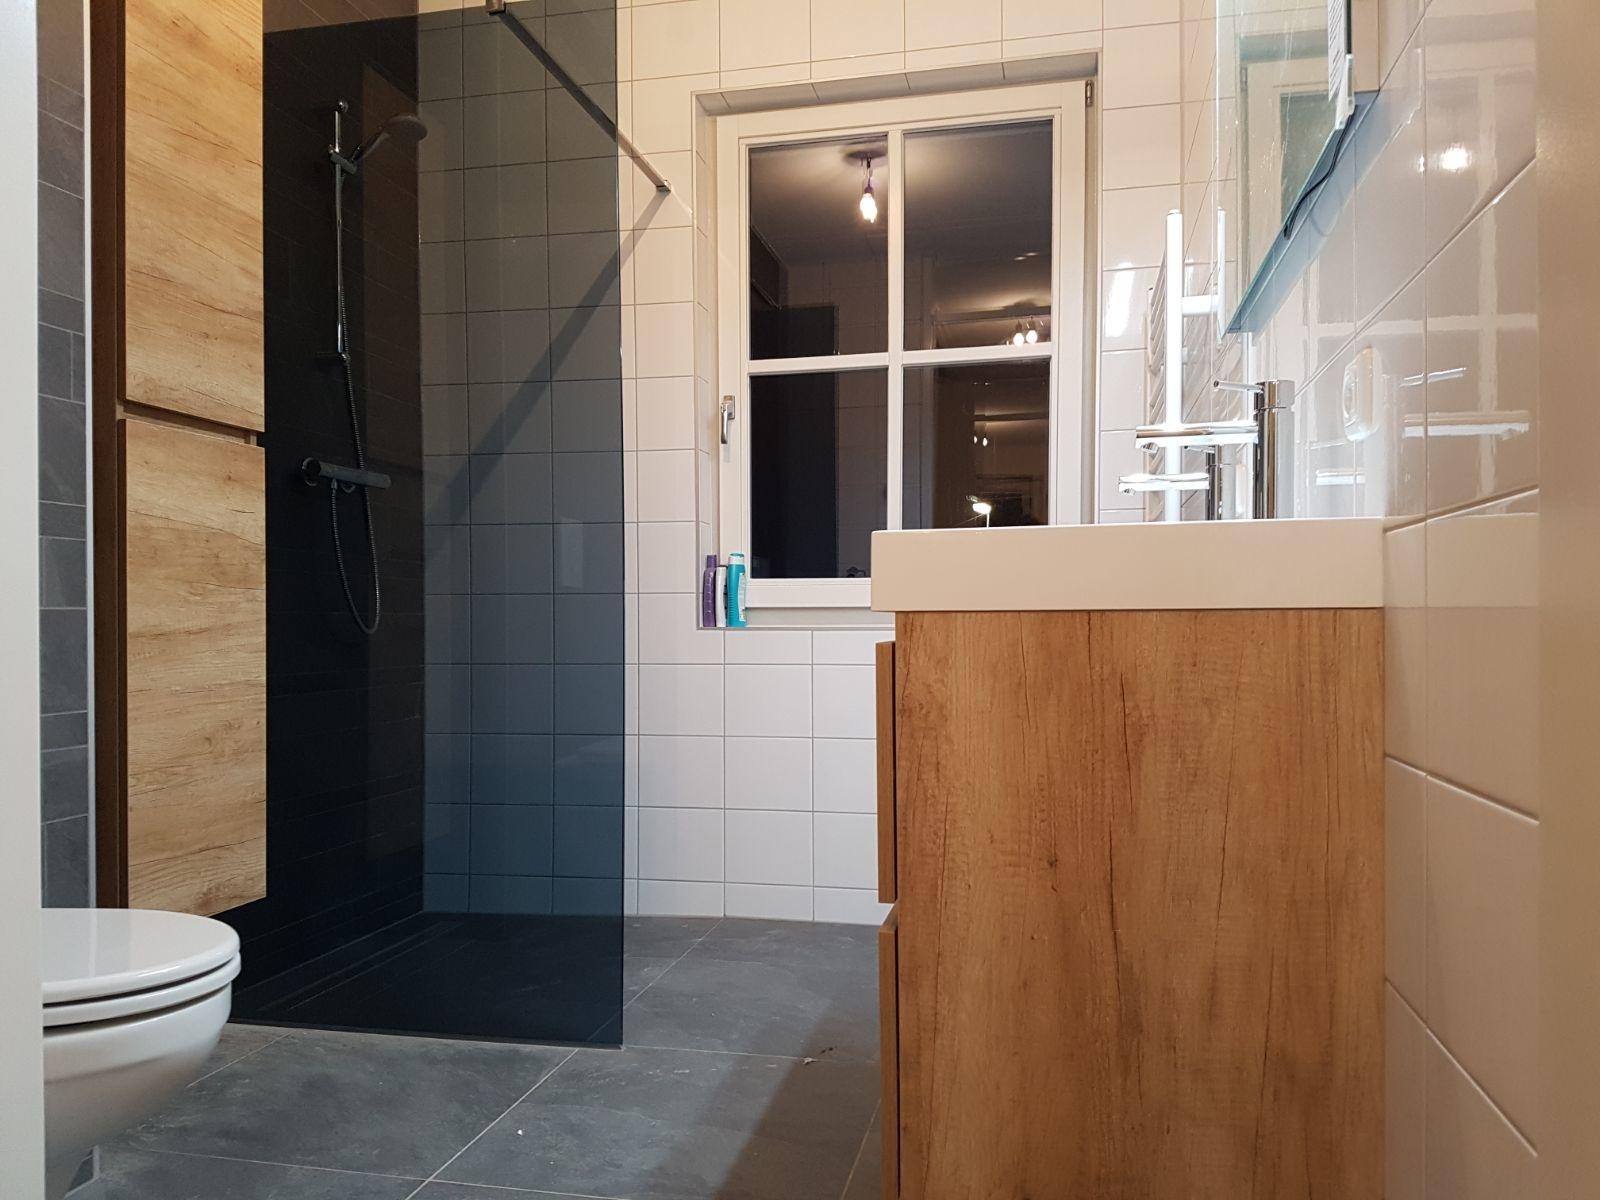 Kosten Leidingen Verleggen Badkamer. Heb With Kosten Leidingen ...